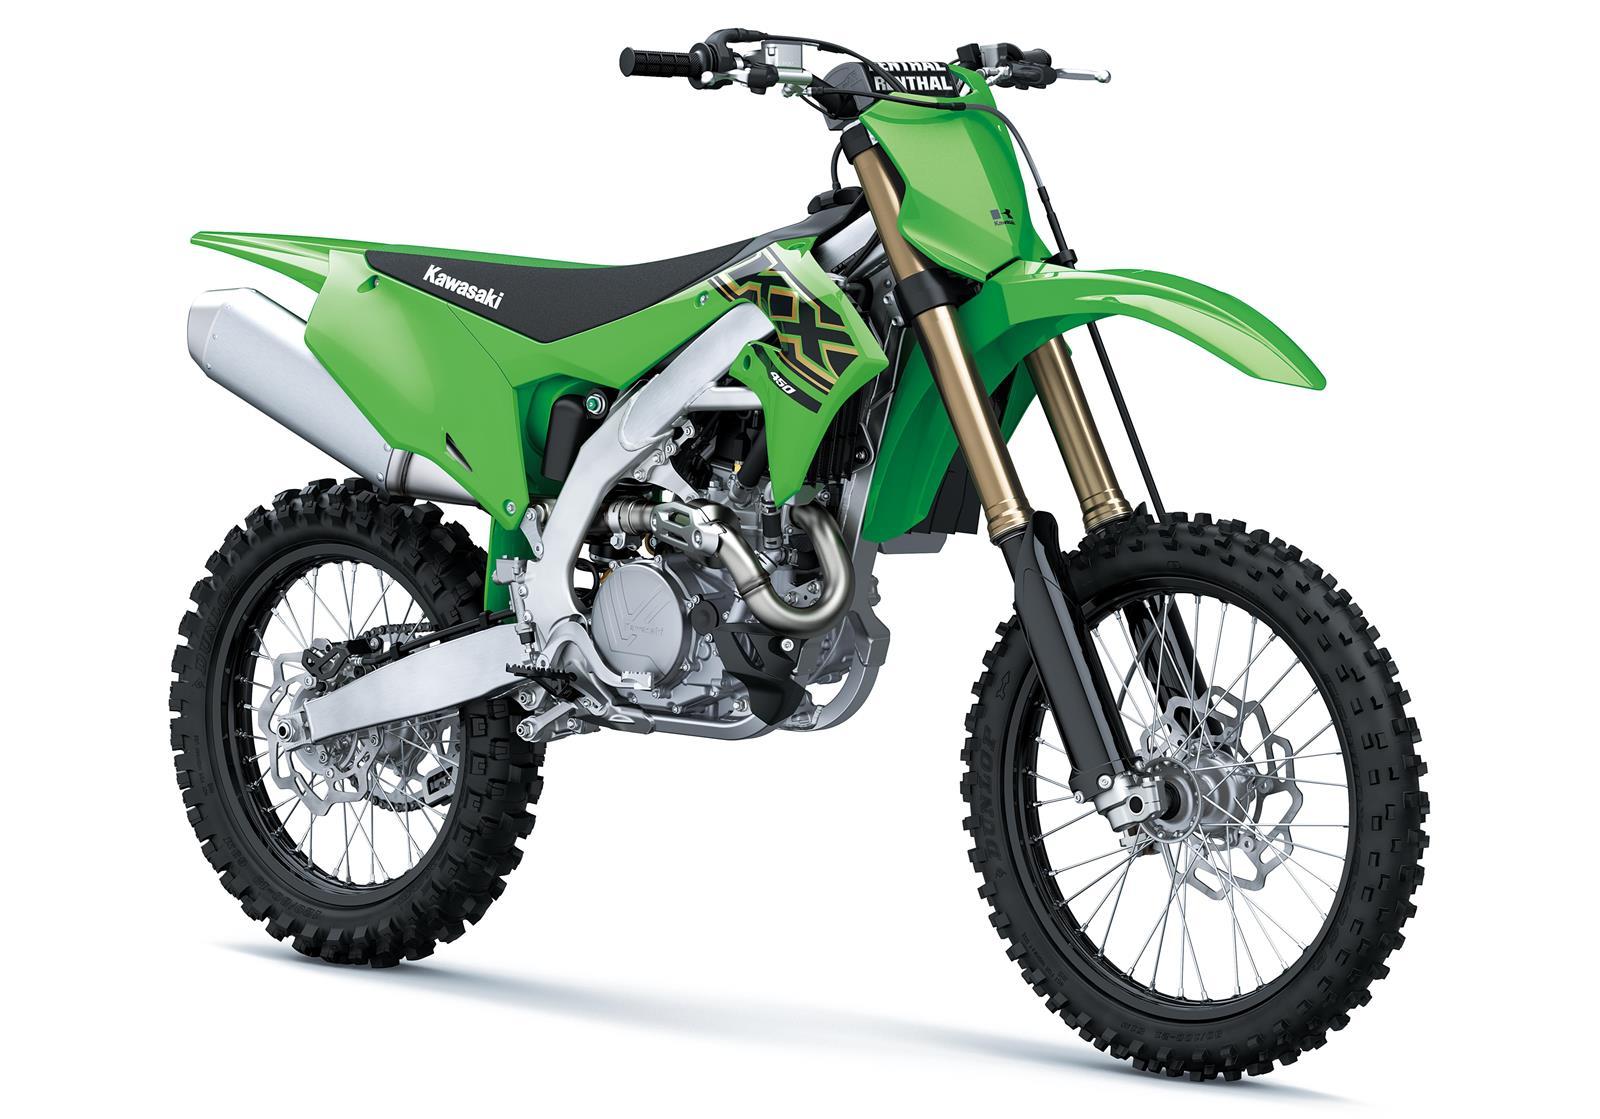 KX450 -1